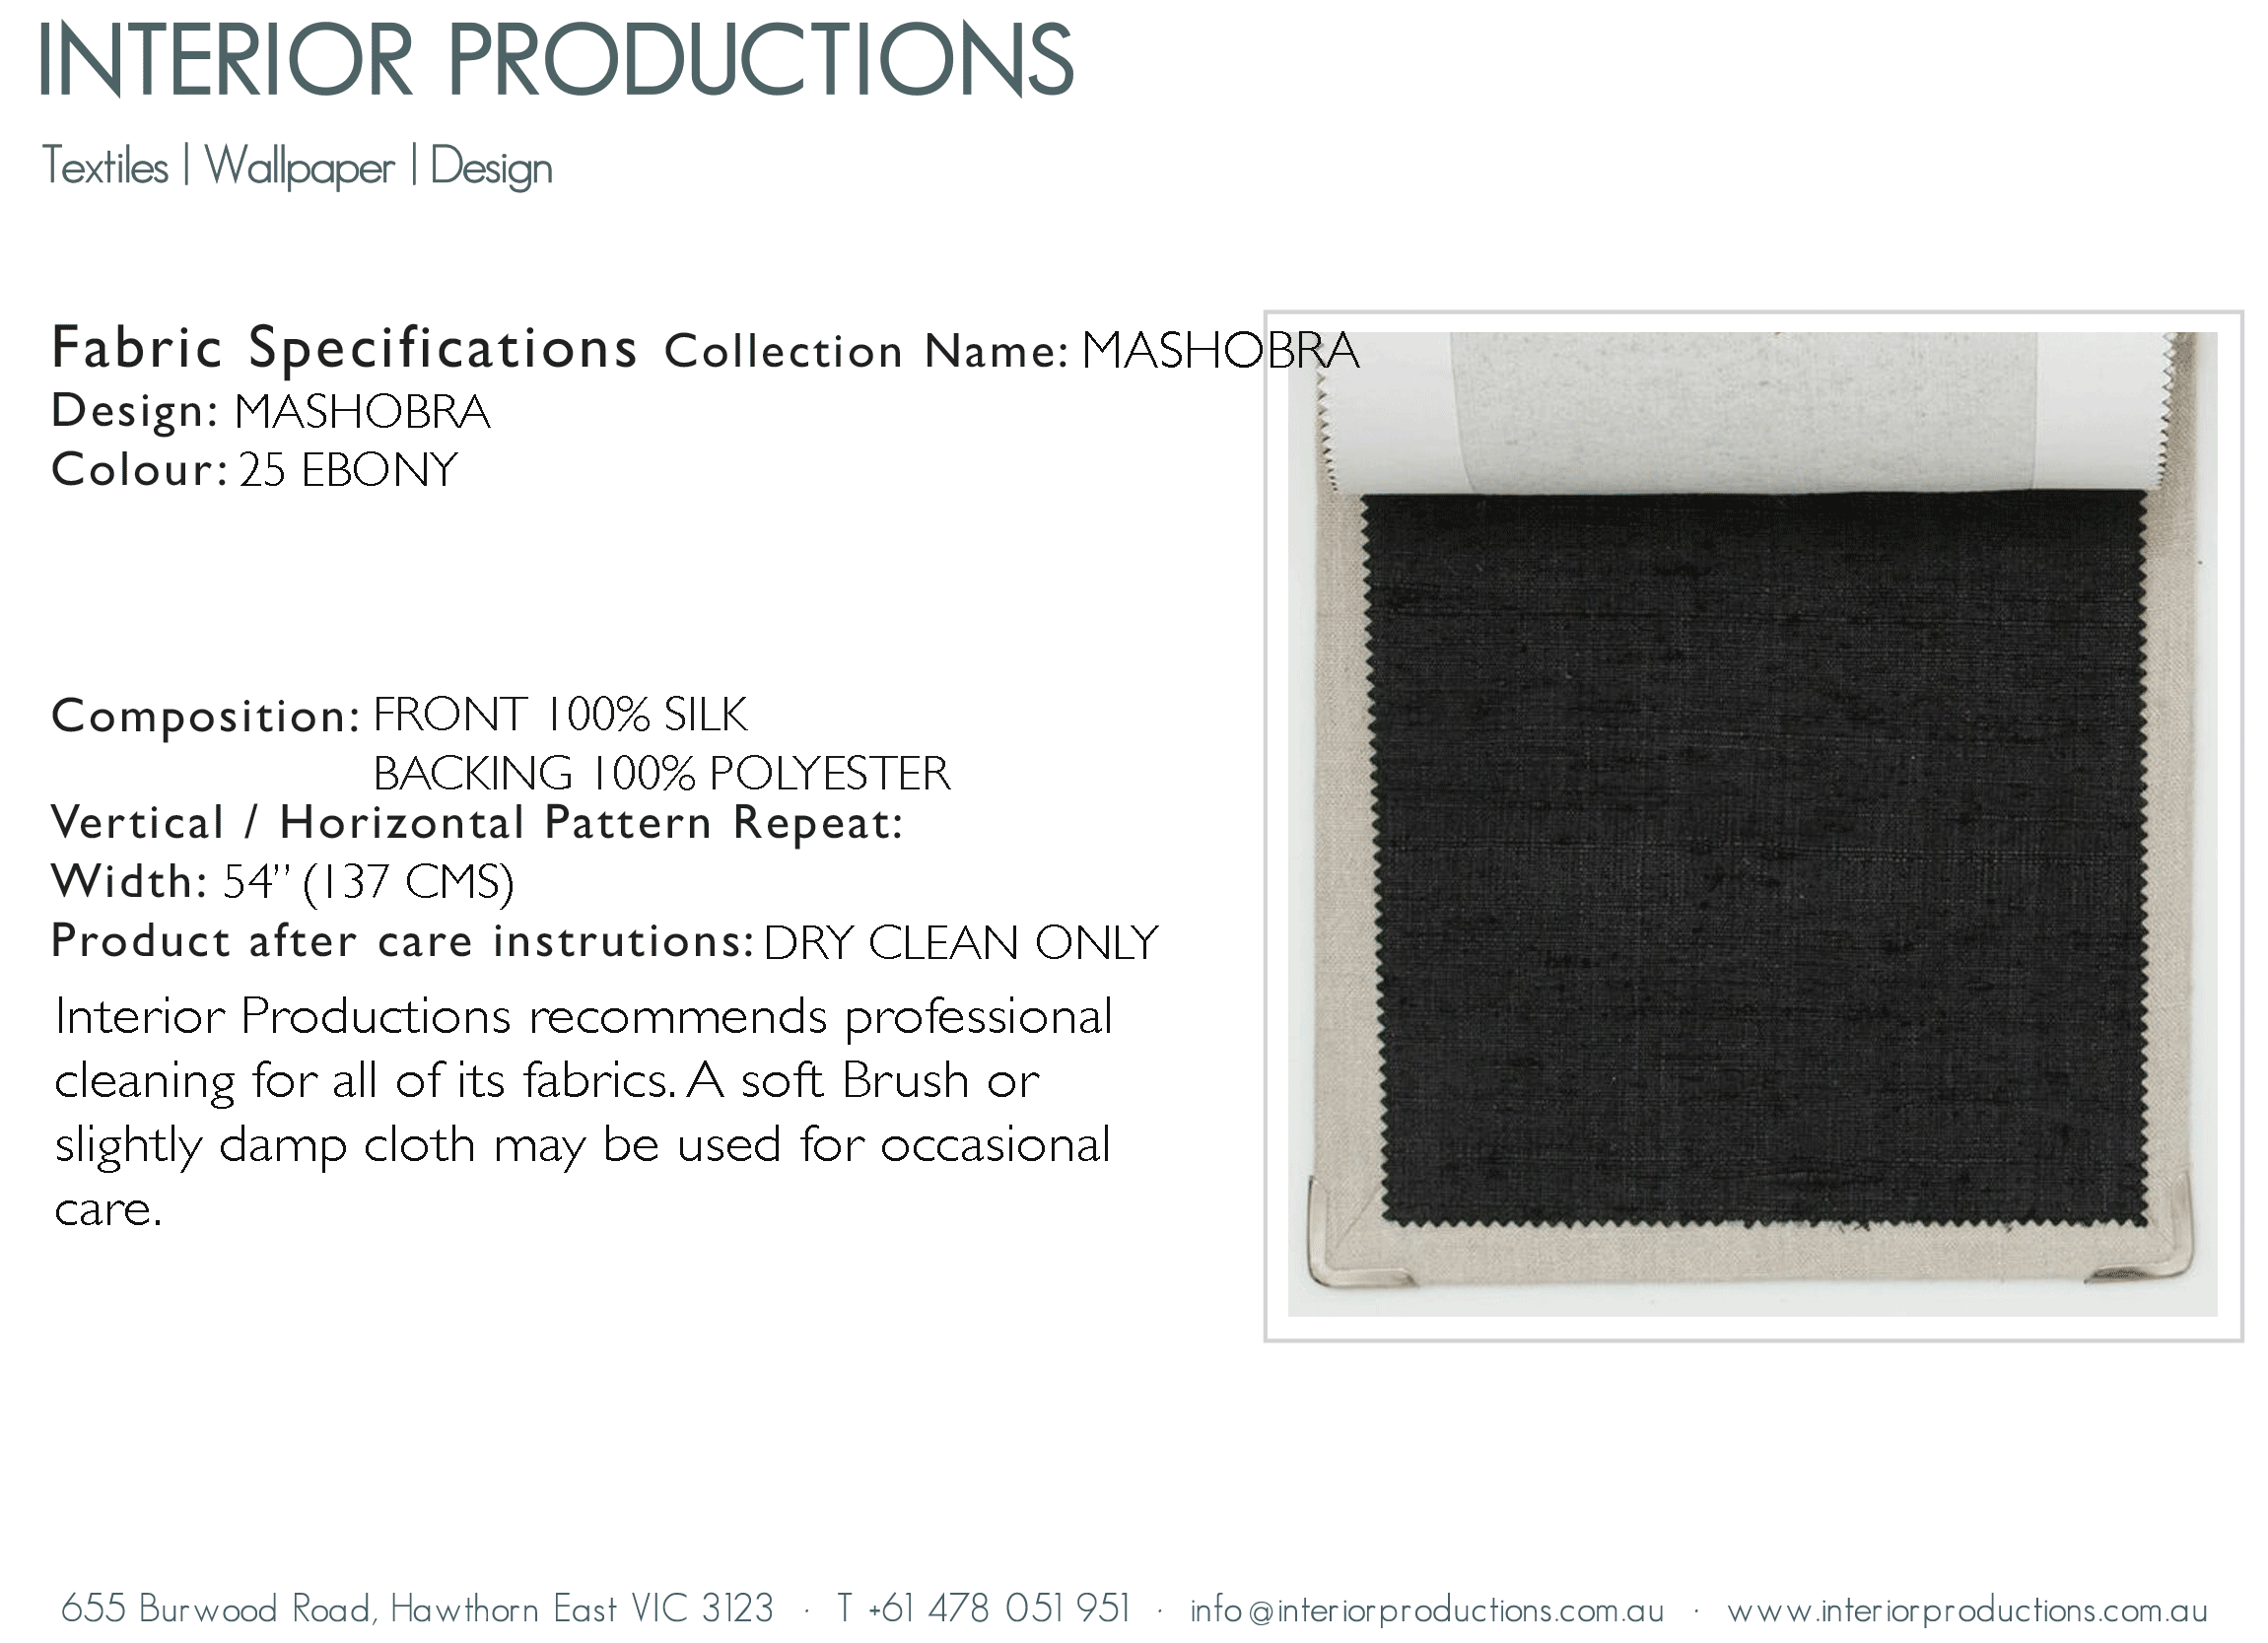 interior_productions_MASHOBRA---25-EBONY